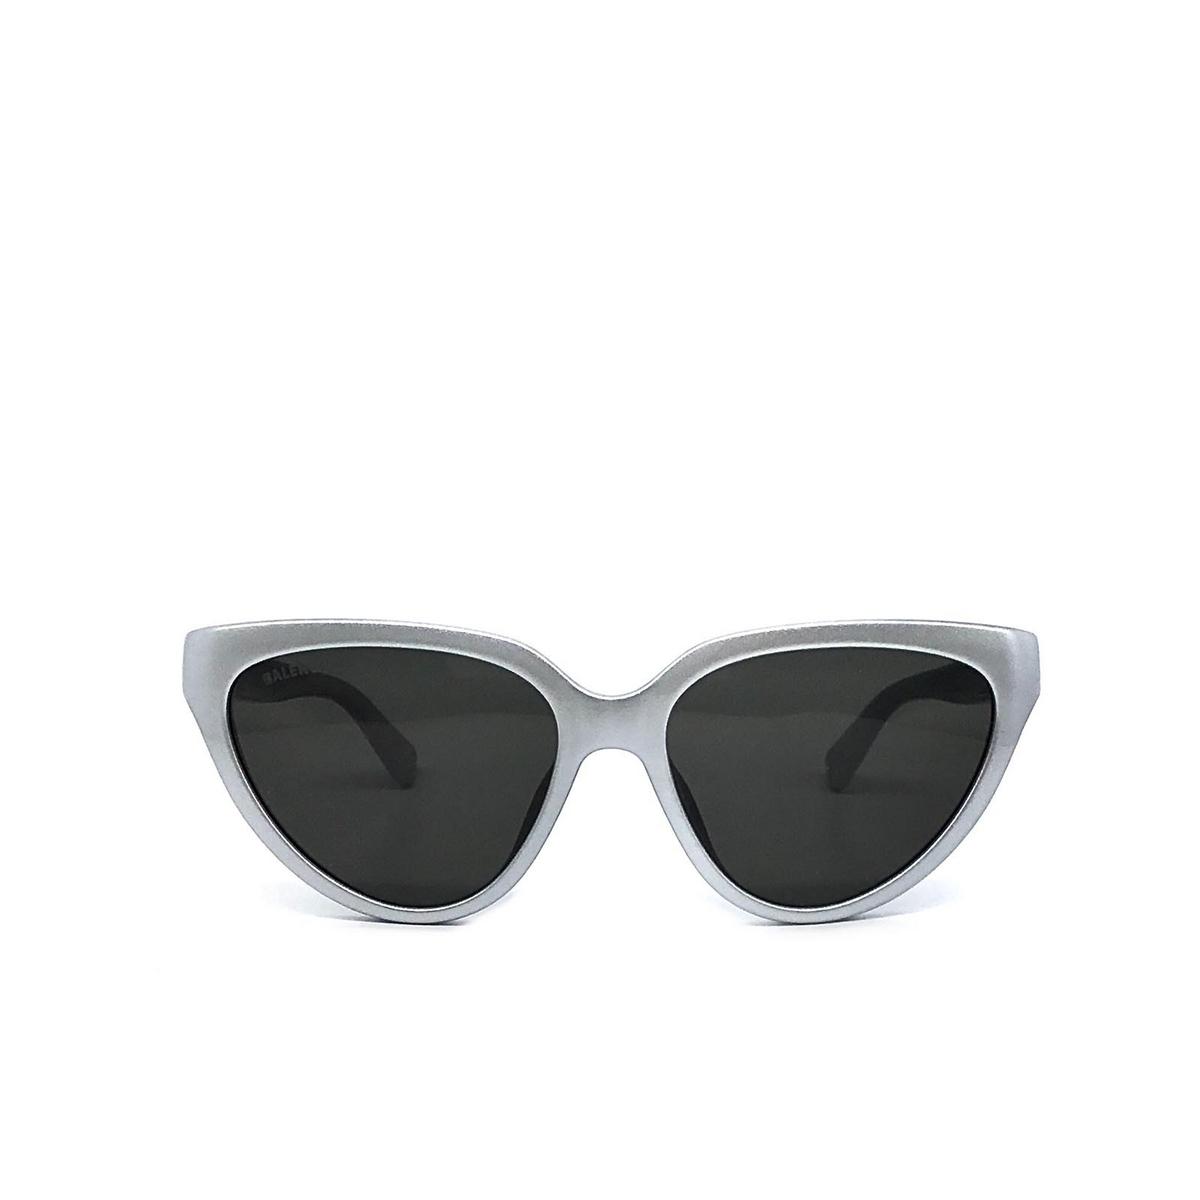 Balenciaga® Cat-eye Sunglasses: BB0149S color Silver 003 - front view.